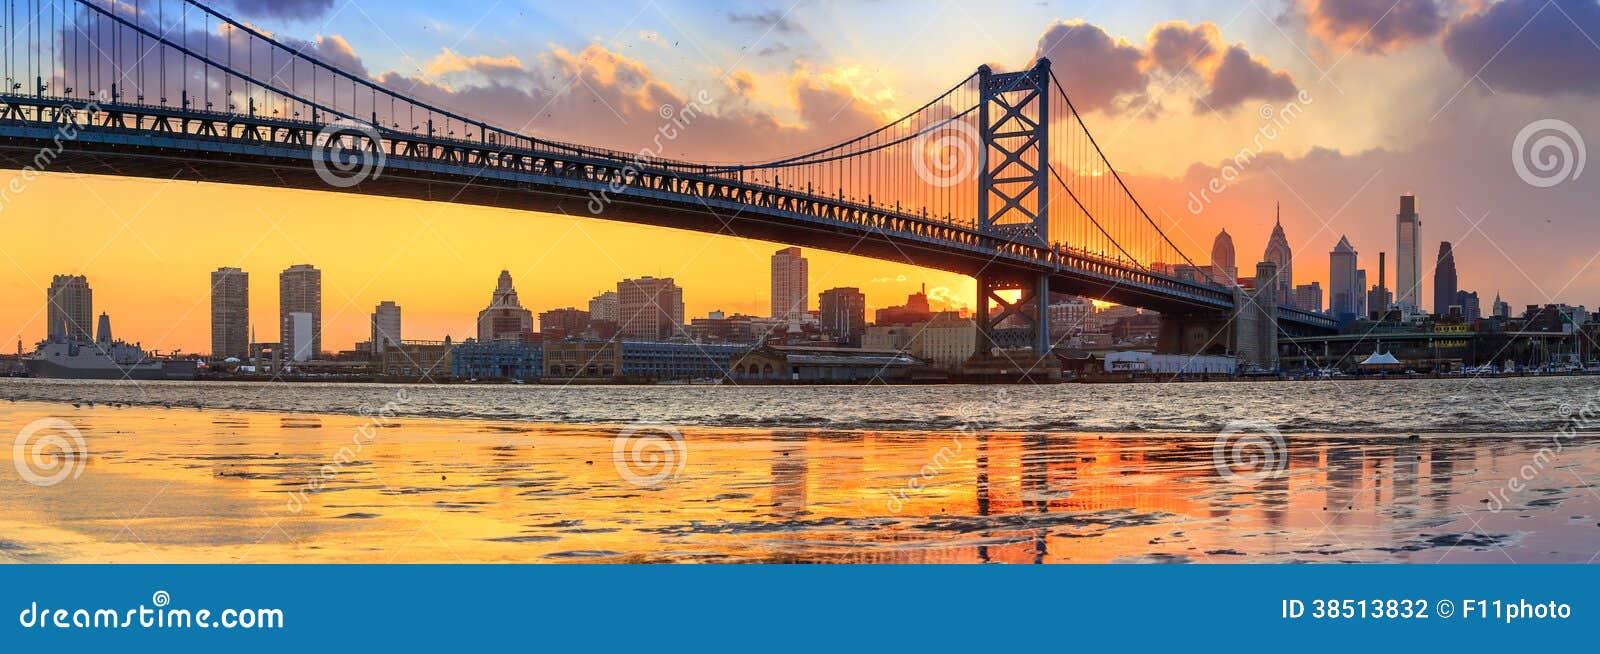 Panorama of Philadelphia skyline, Ben Franklin Bridge and Penn s